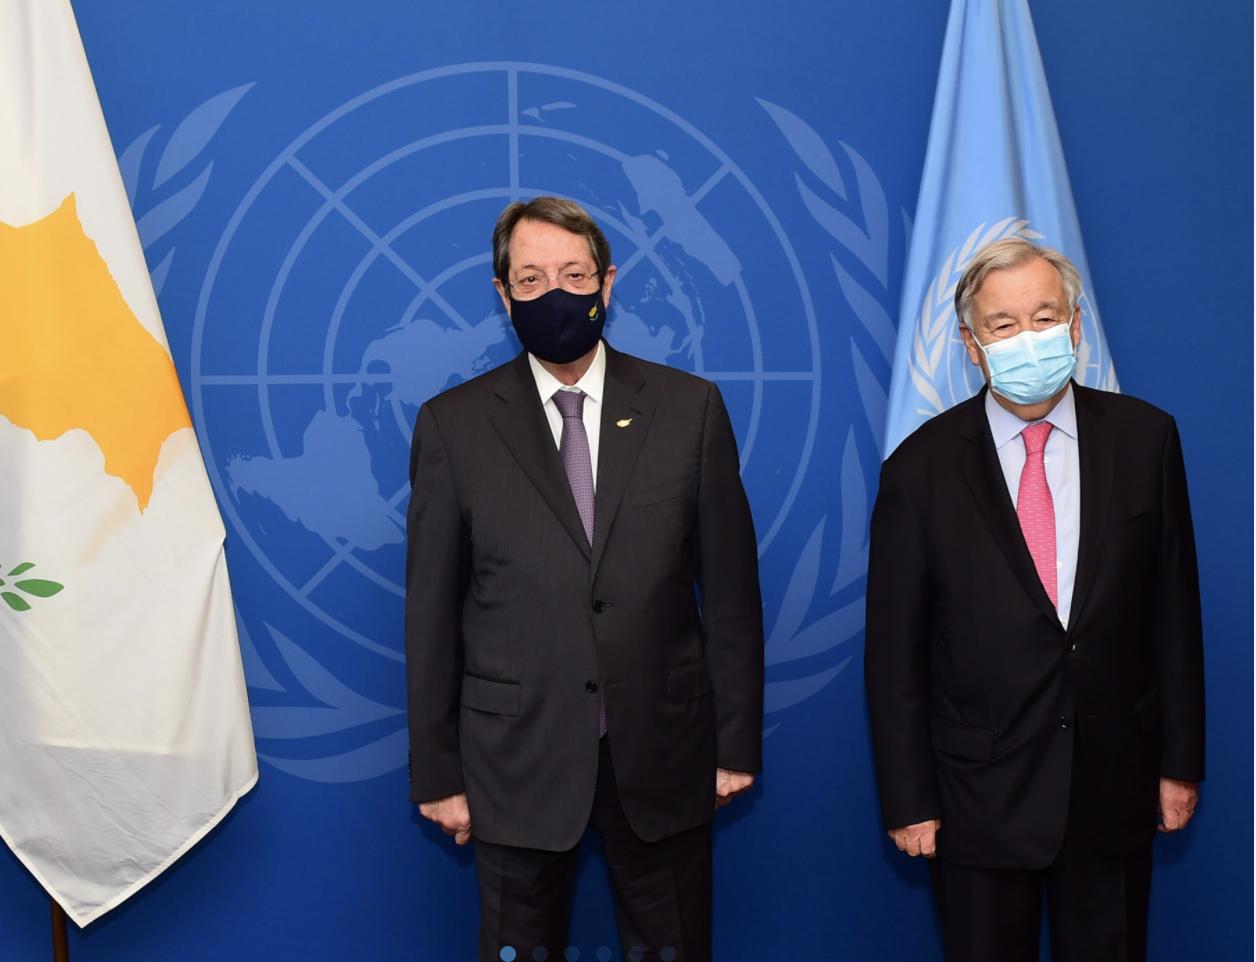 Kipar: Predsednik Anastasiades se sastao sa generalnim sekretarom UN Guterresom